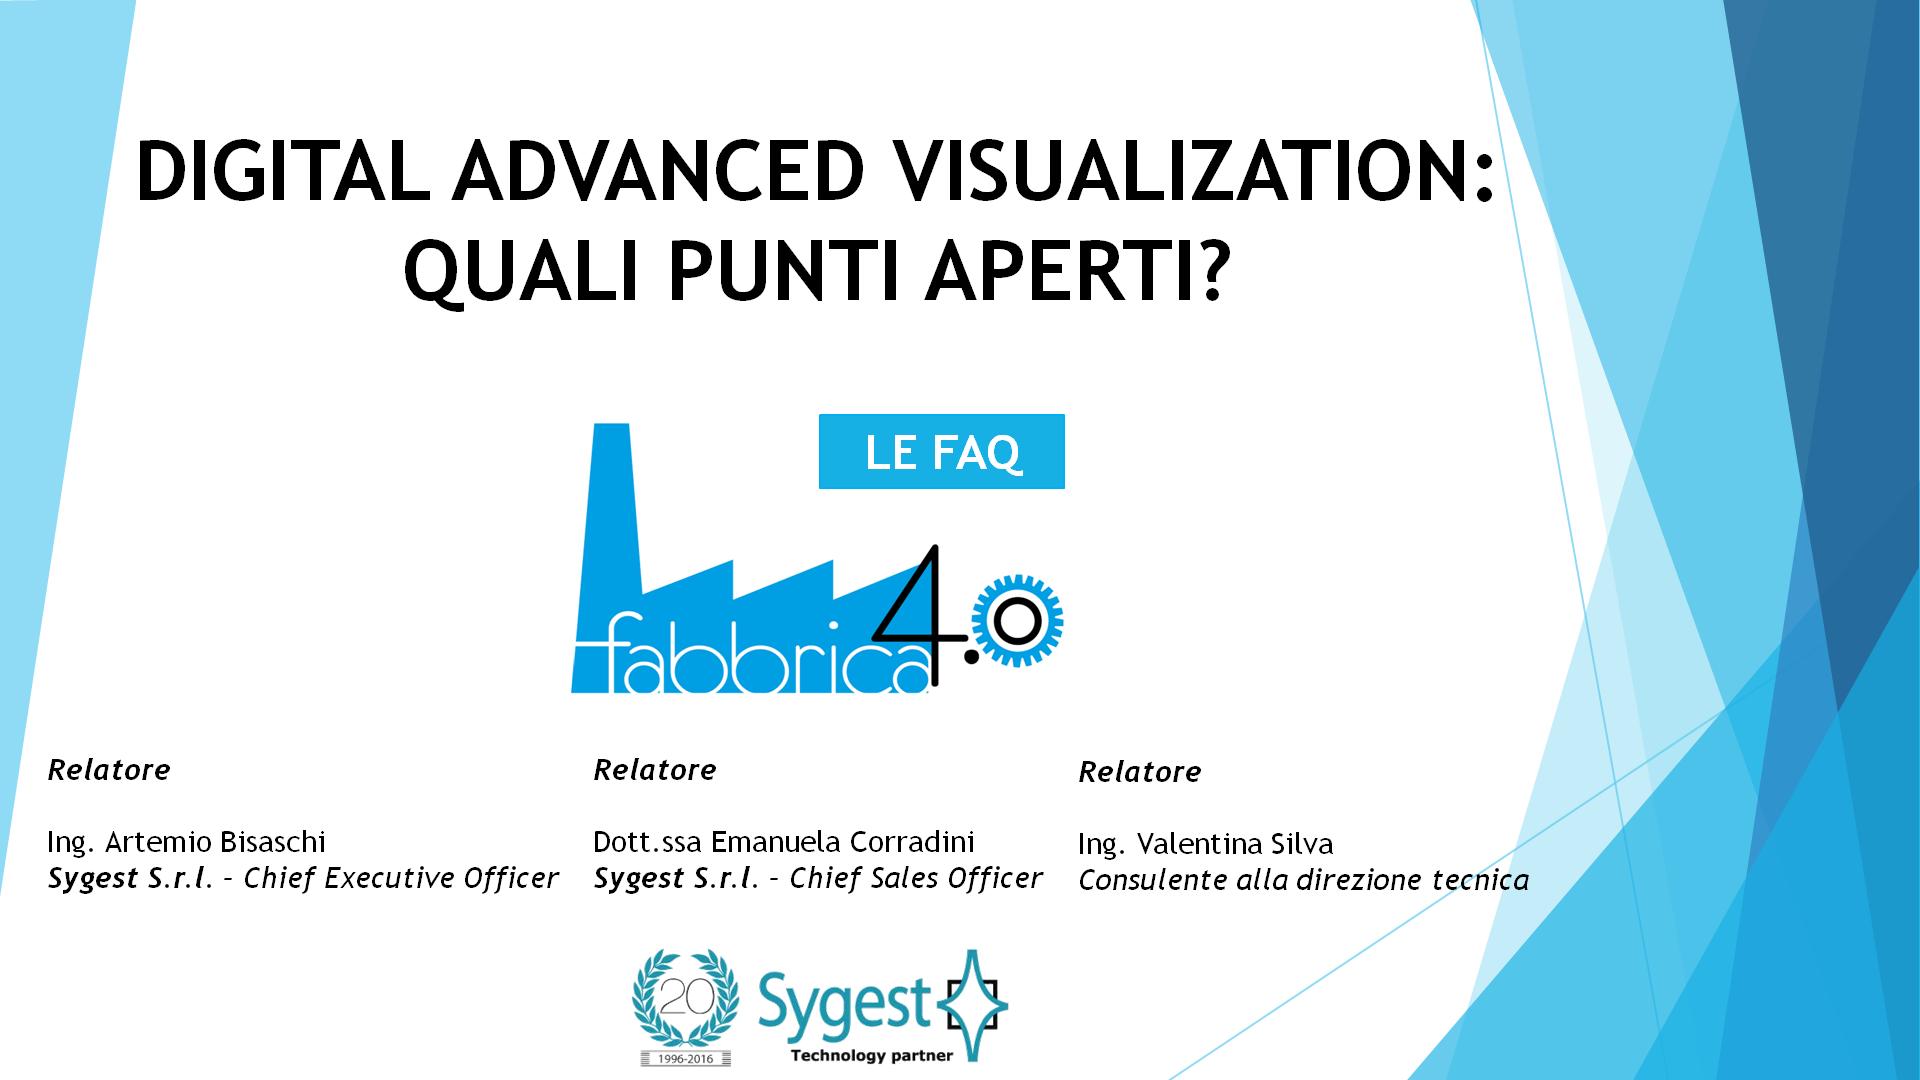 Fabbrica 4.0 - Digital Advanced Visualization   Sygest